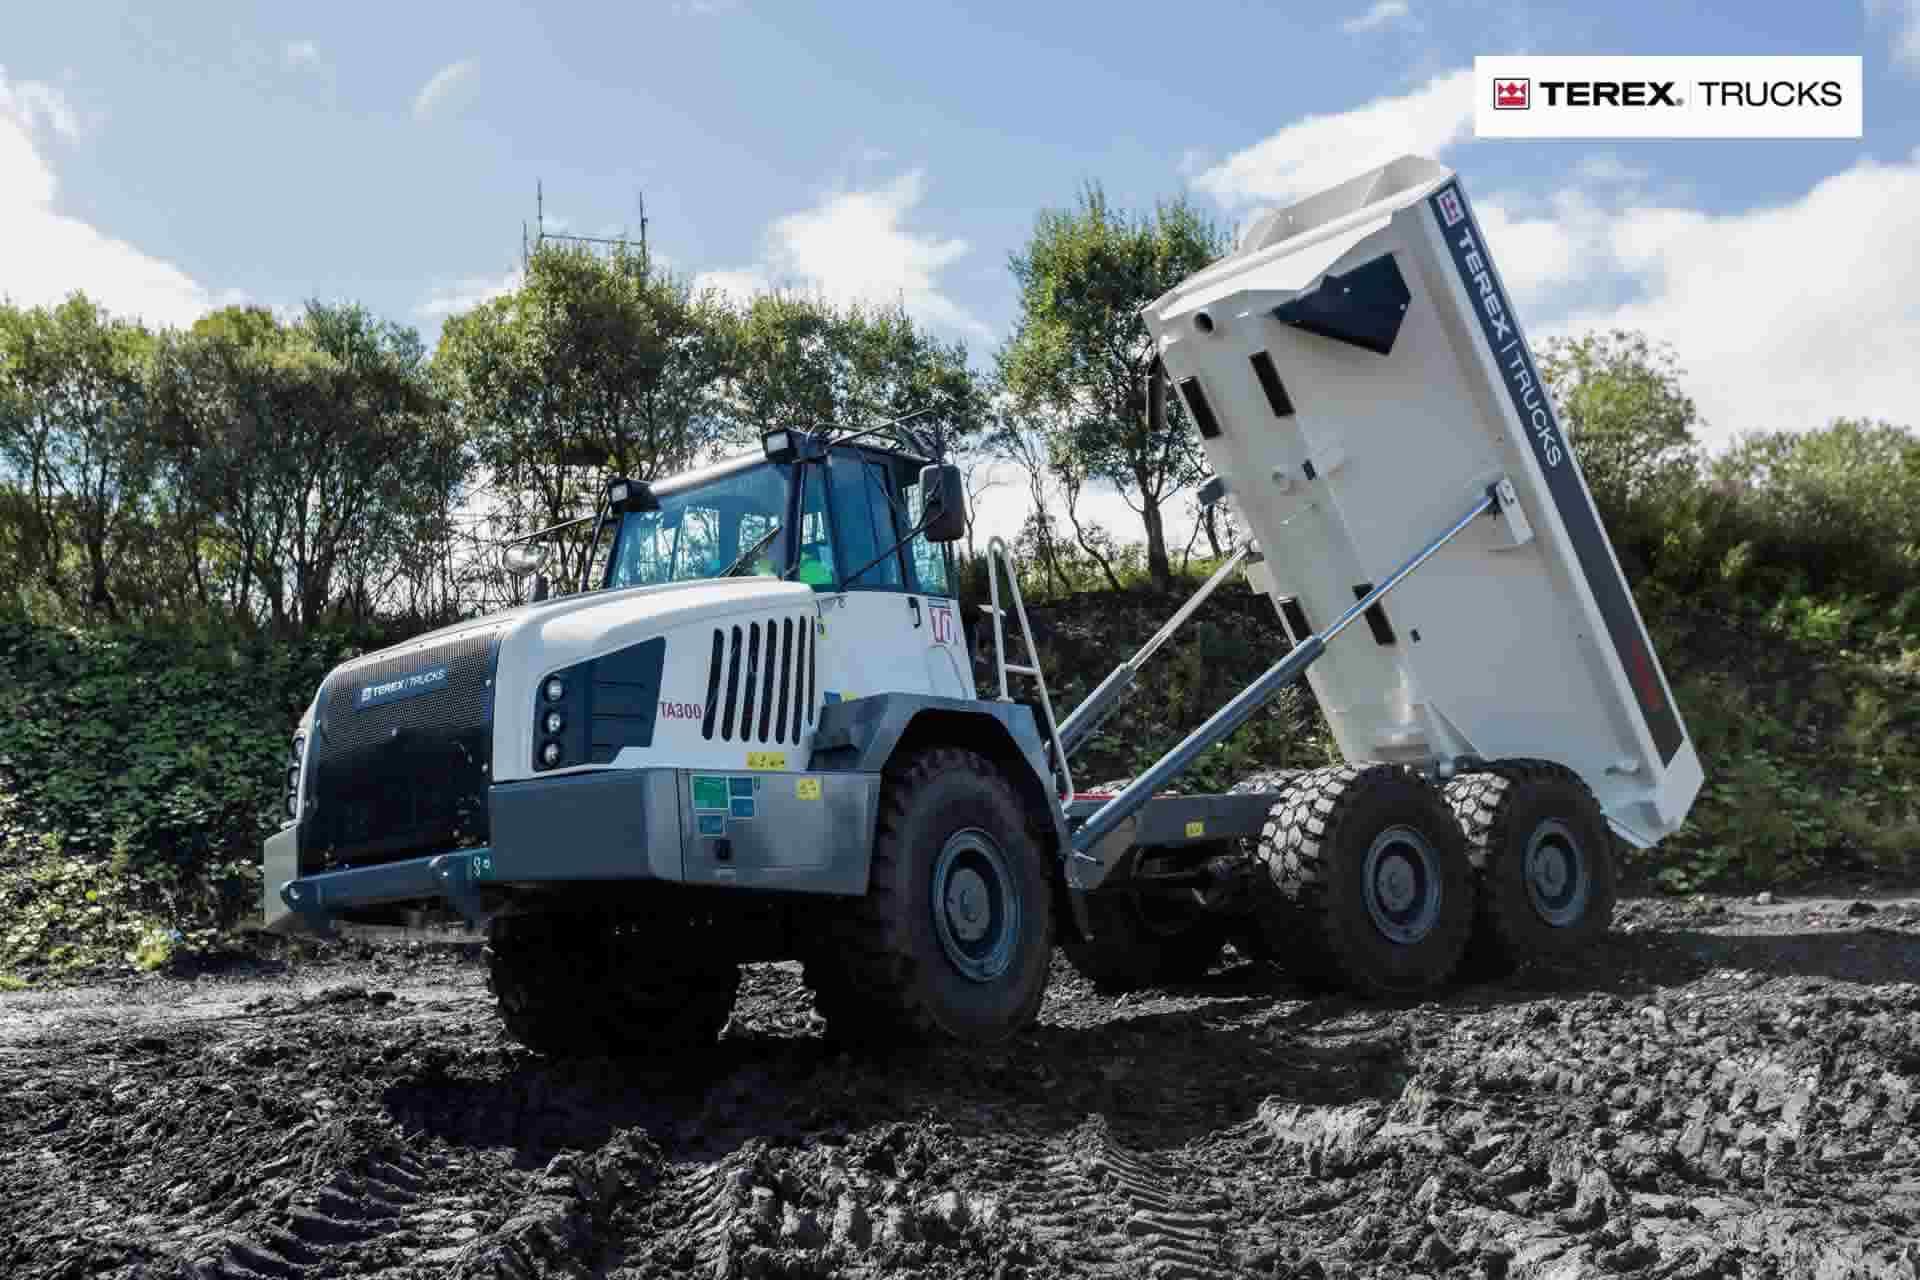 Terex Trucks Virtual Tours